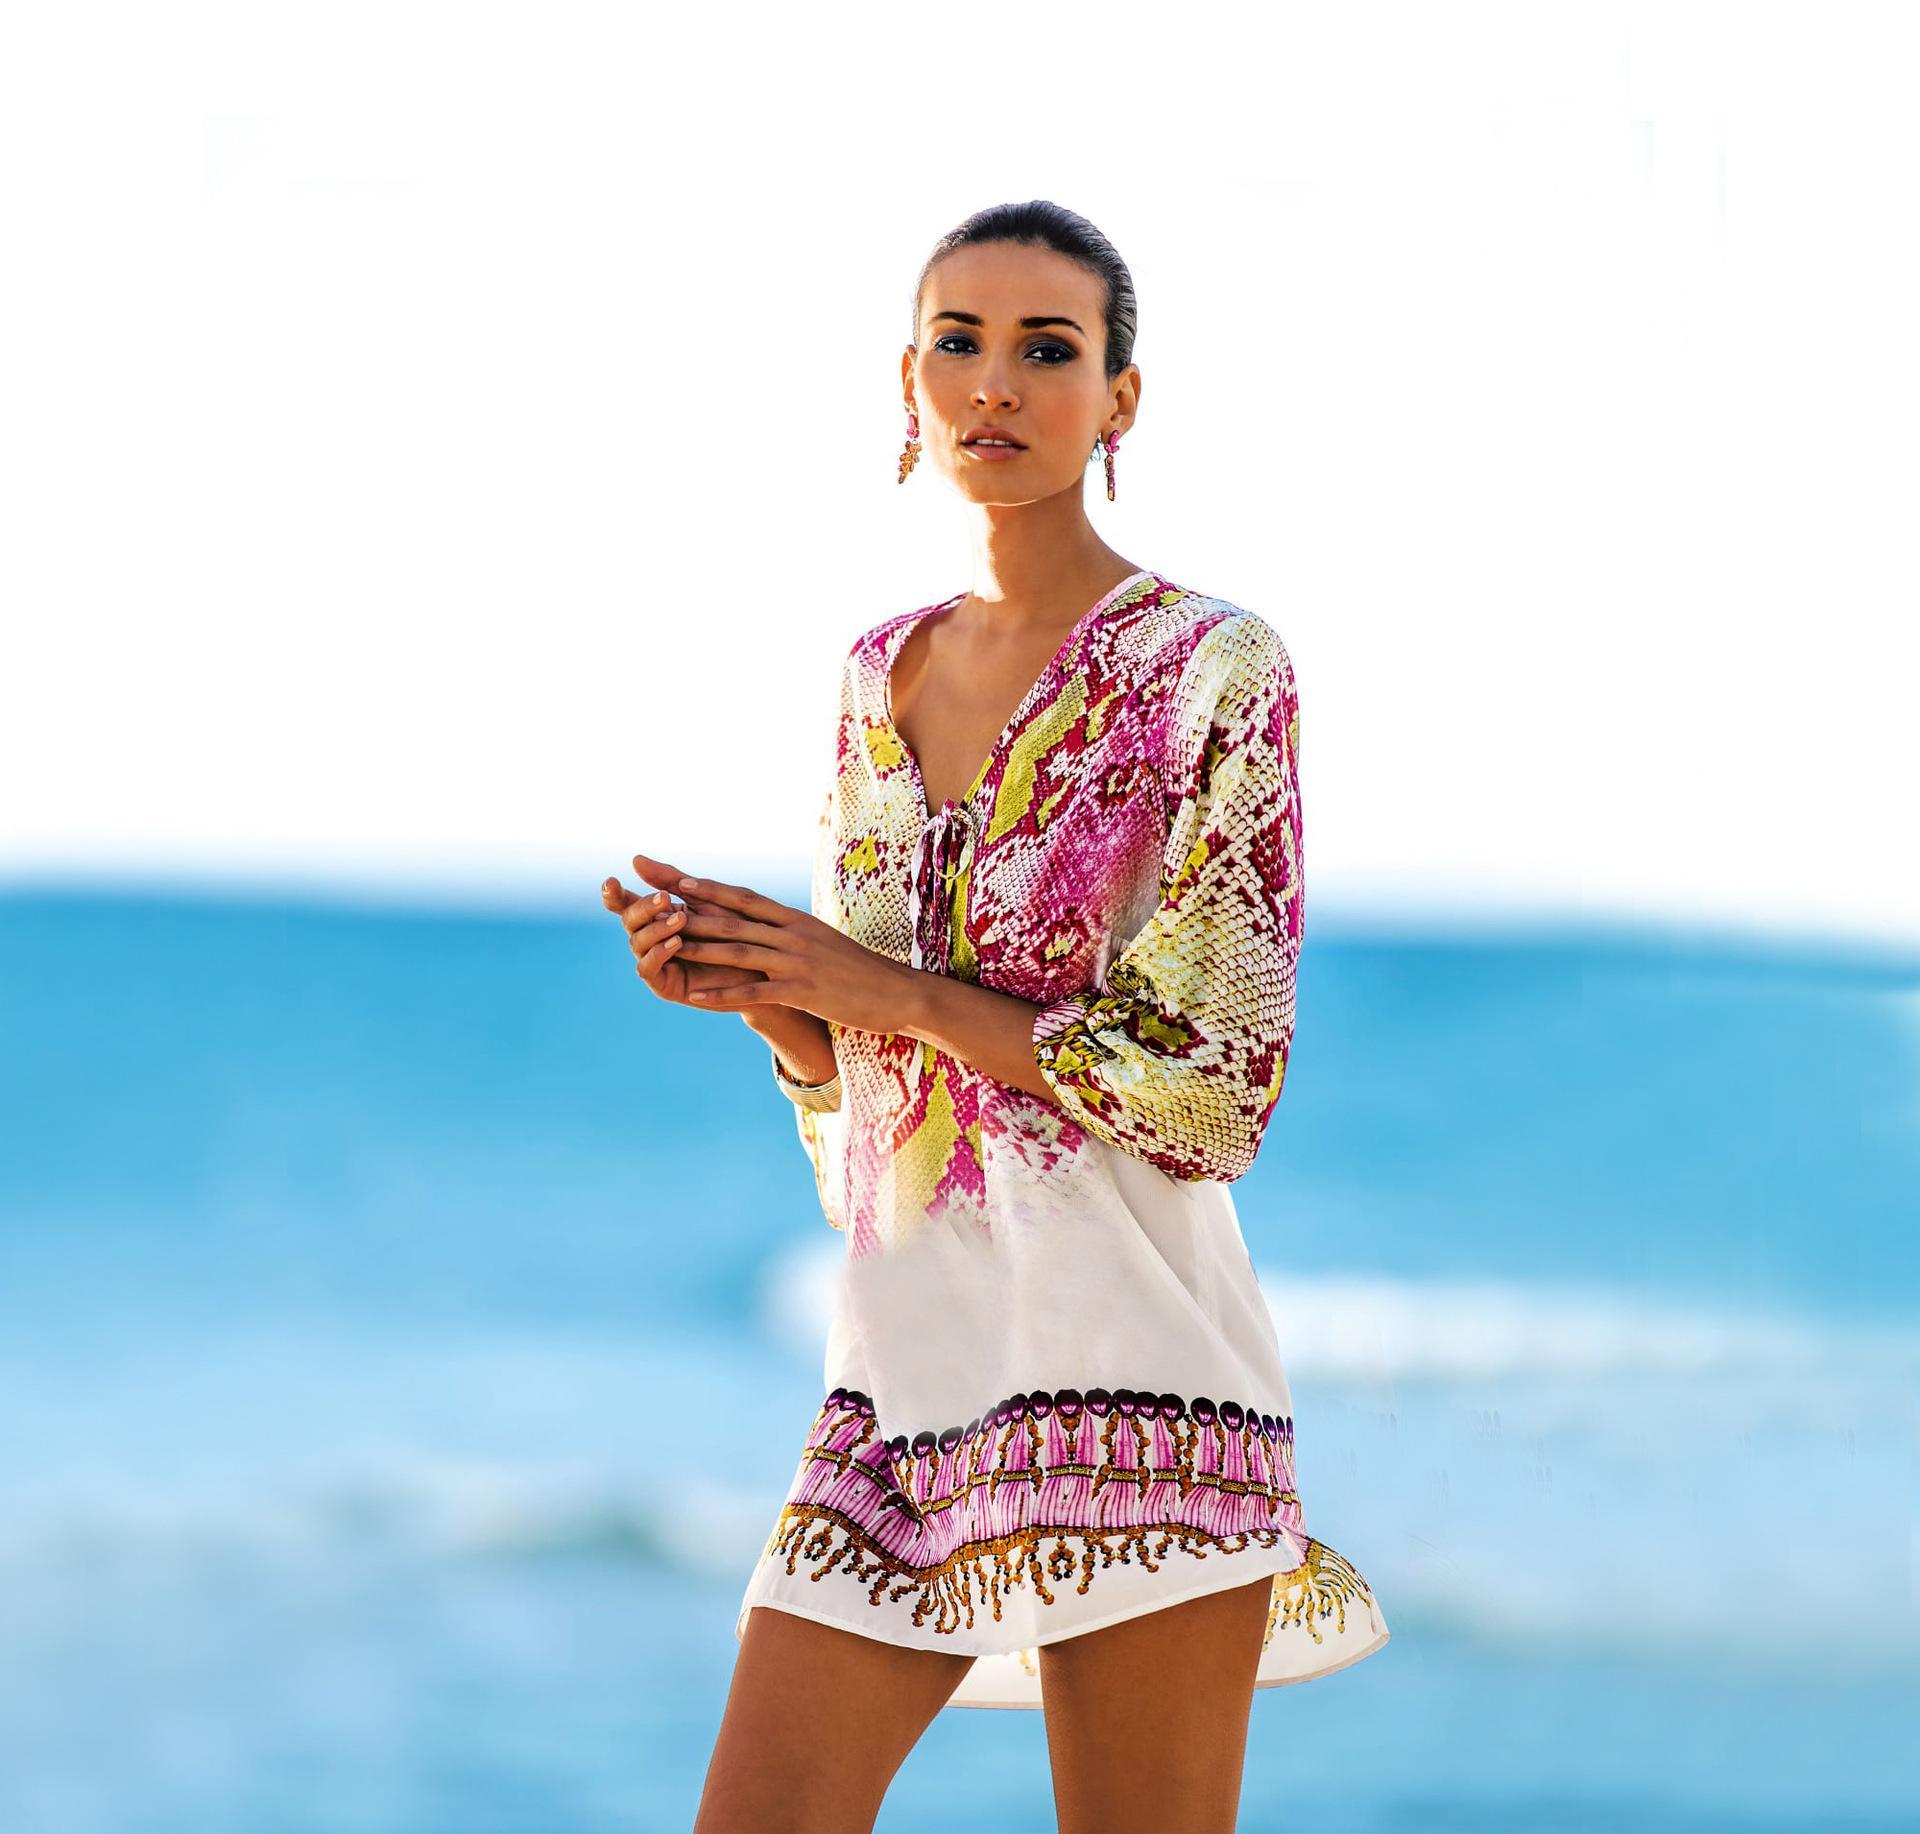 2020 Beach Swimwear Women Dress Cover Up Wear Women 39 S Plus Size Tunic Beachwear Snake Chiffon New Swimsuit Beach Bikinis Print From Amyshop3 21 76 Dhgate Com